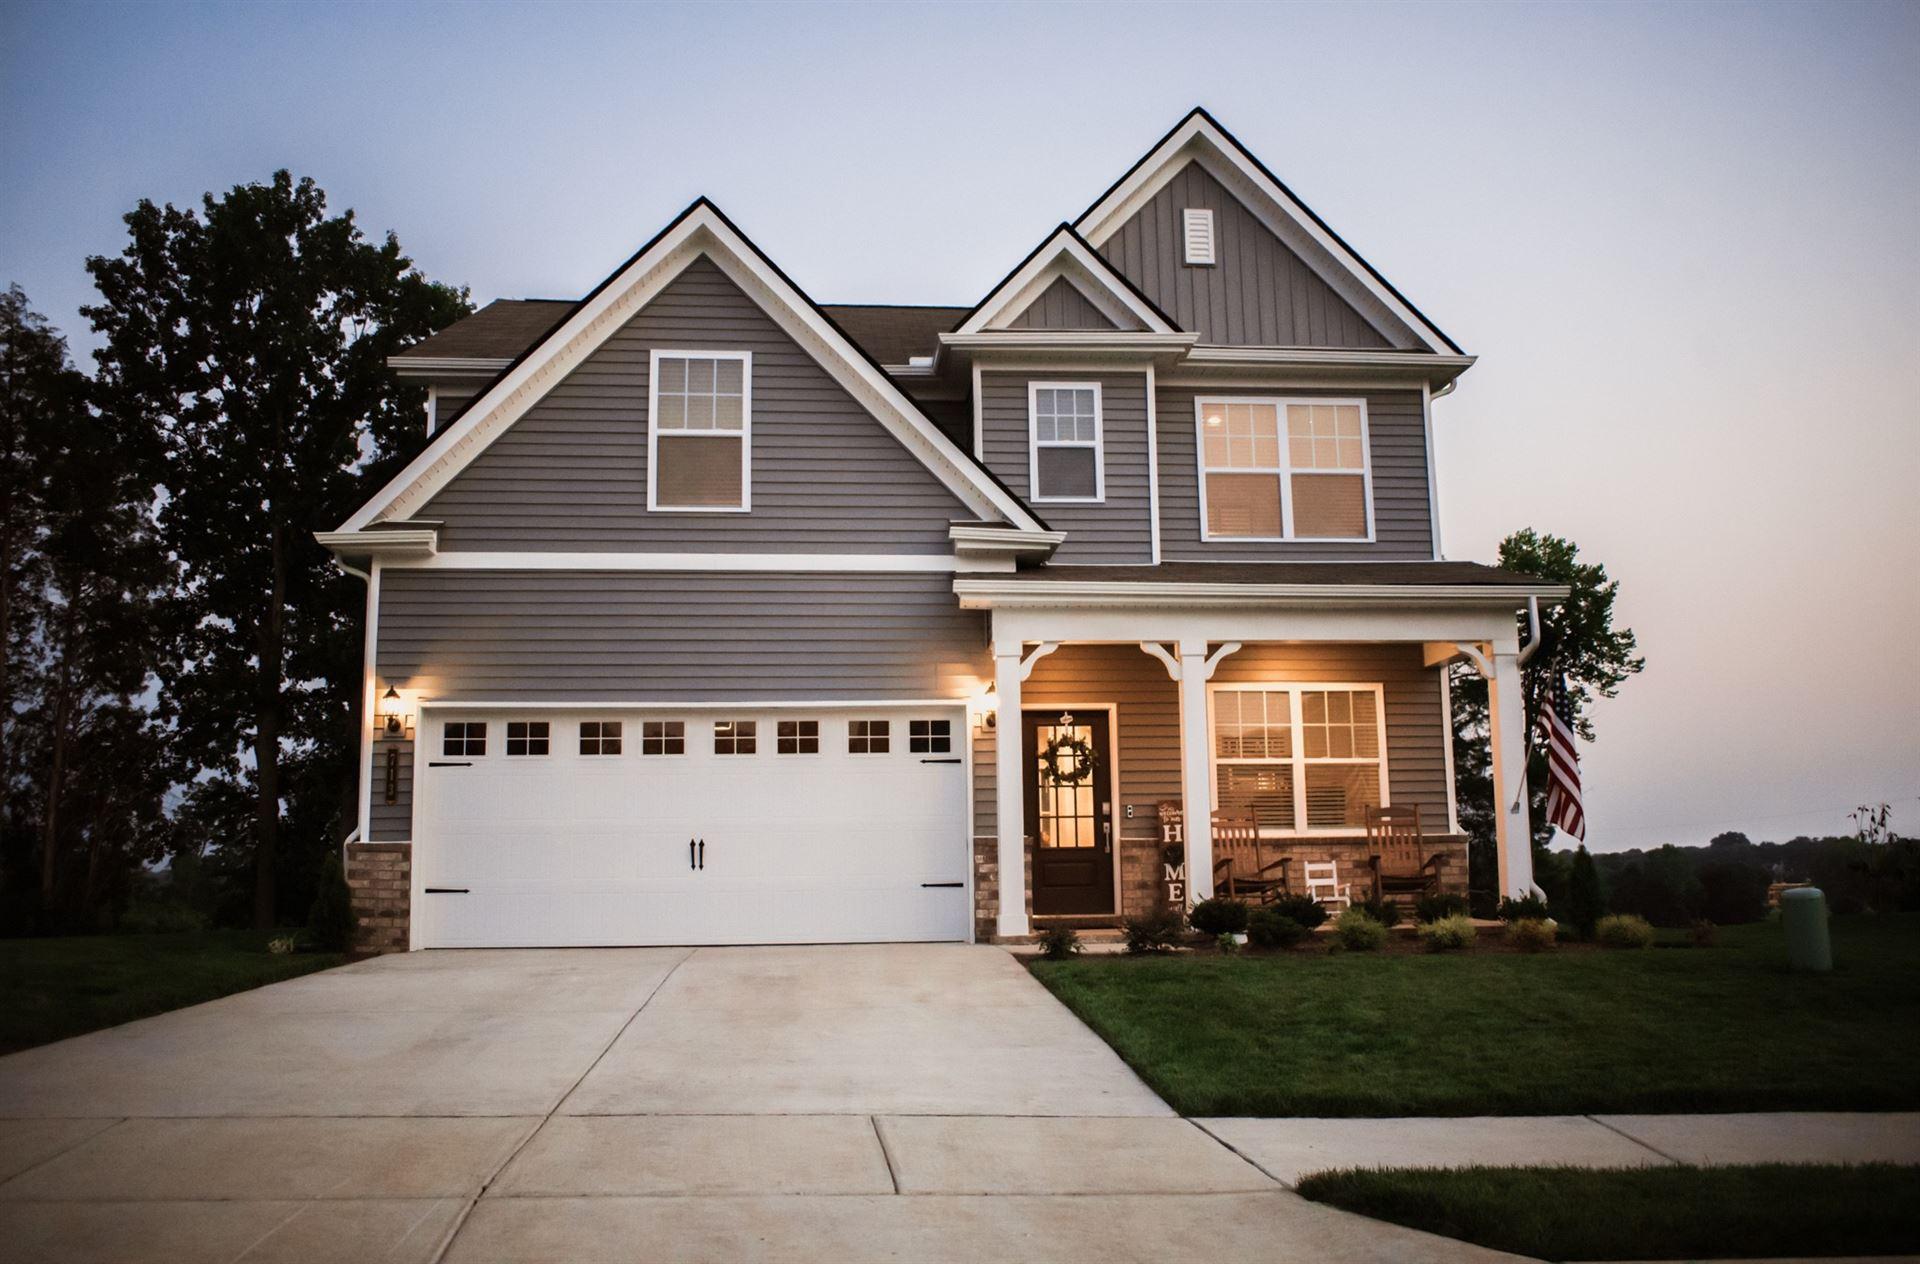 713 Watson Ct, Spring Hill, TN 37174 - MLS#: 2278534